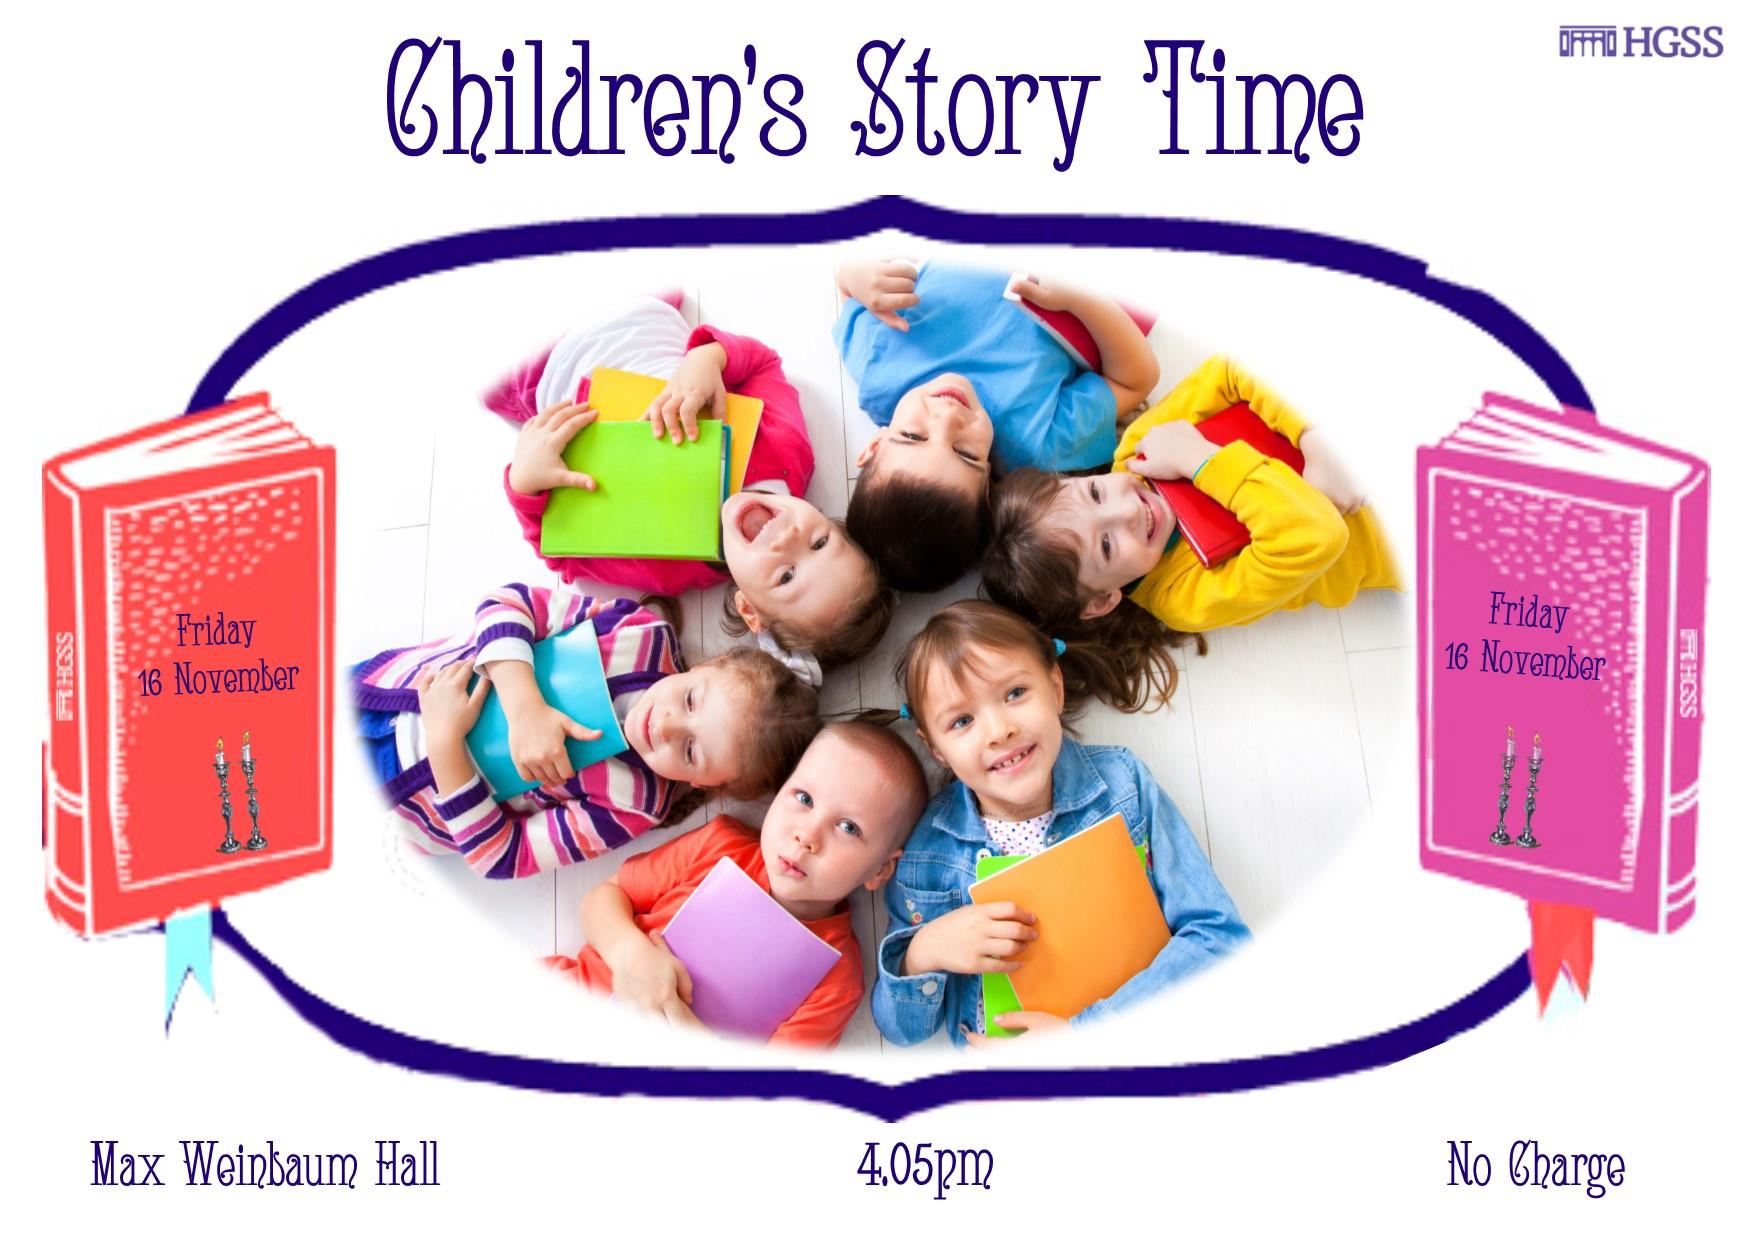 Children's Story Time @ Max Weinbaum Hall